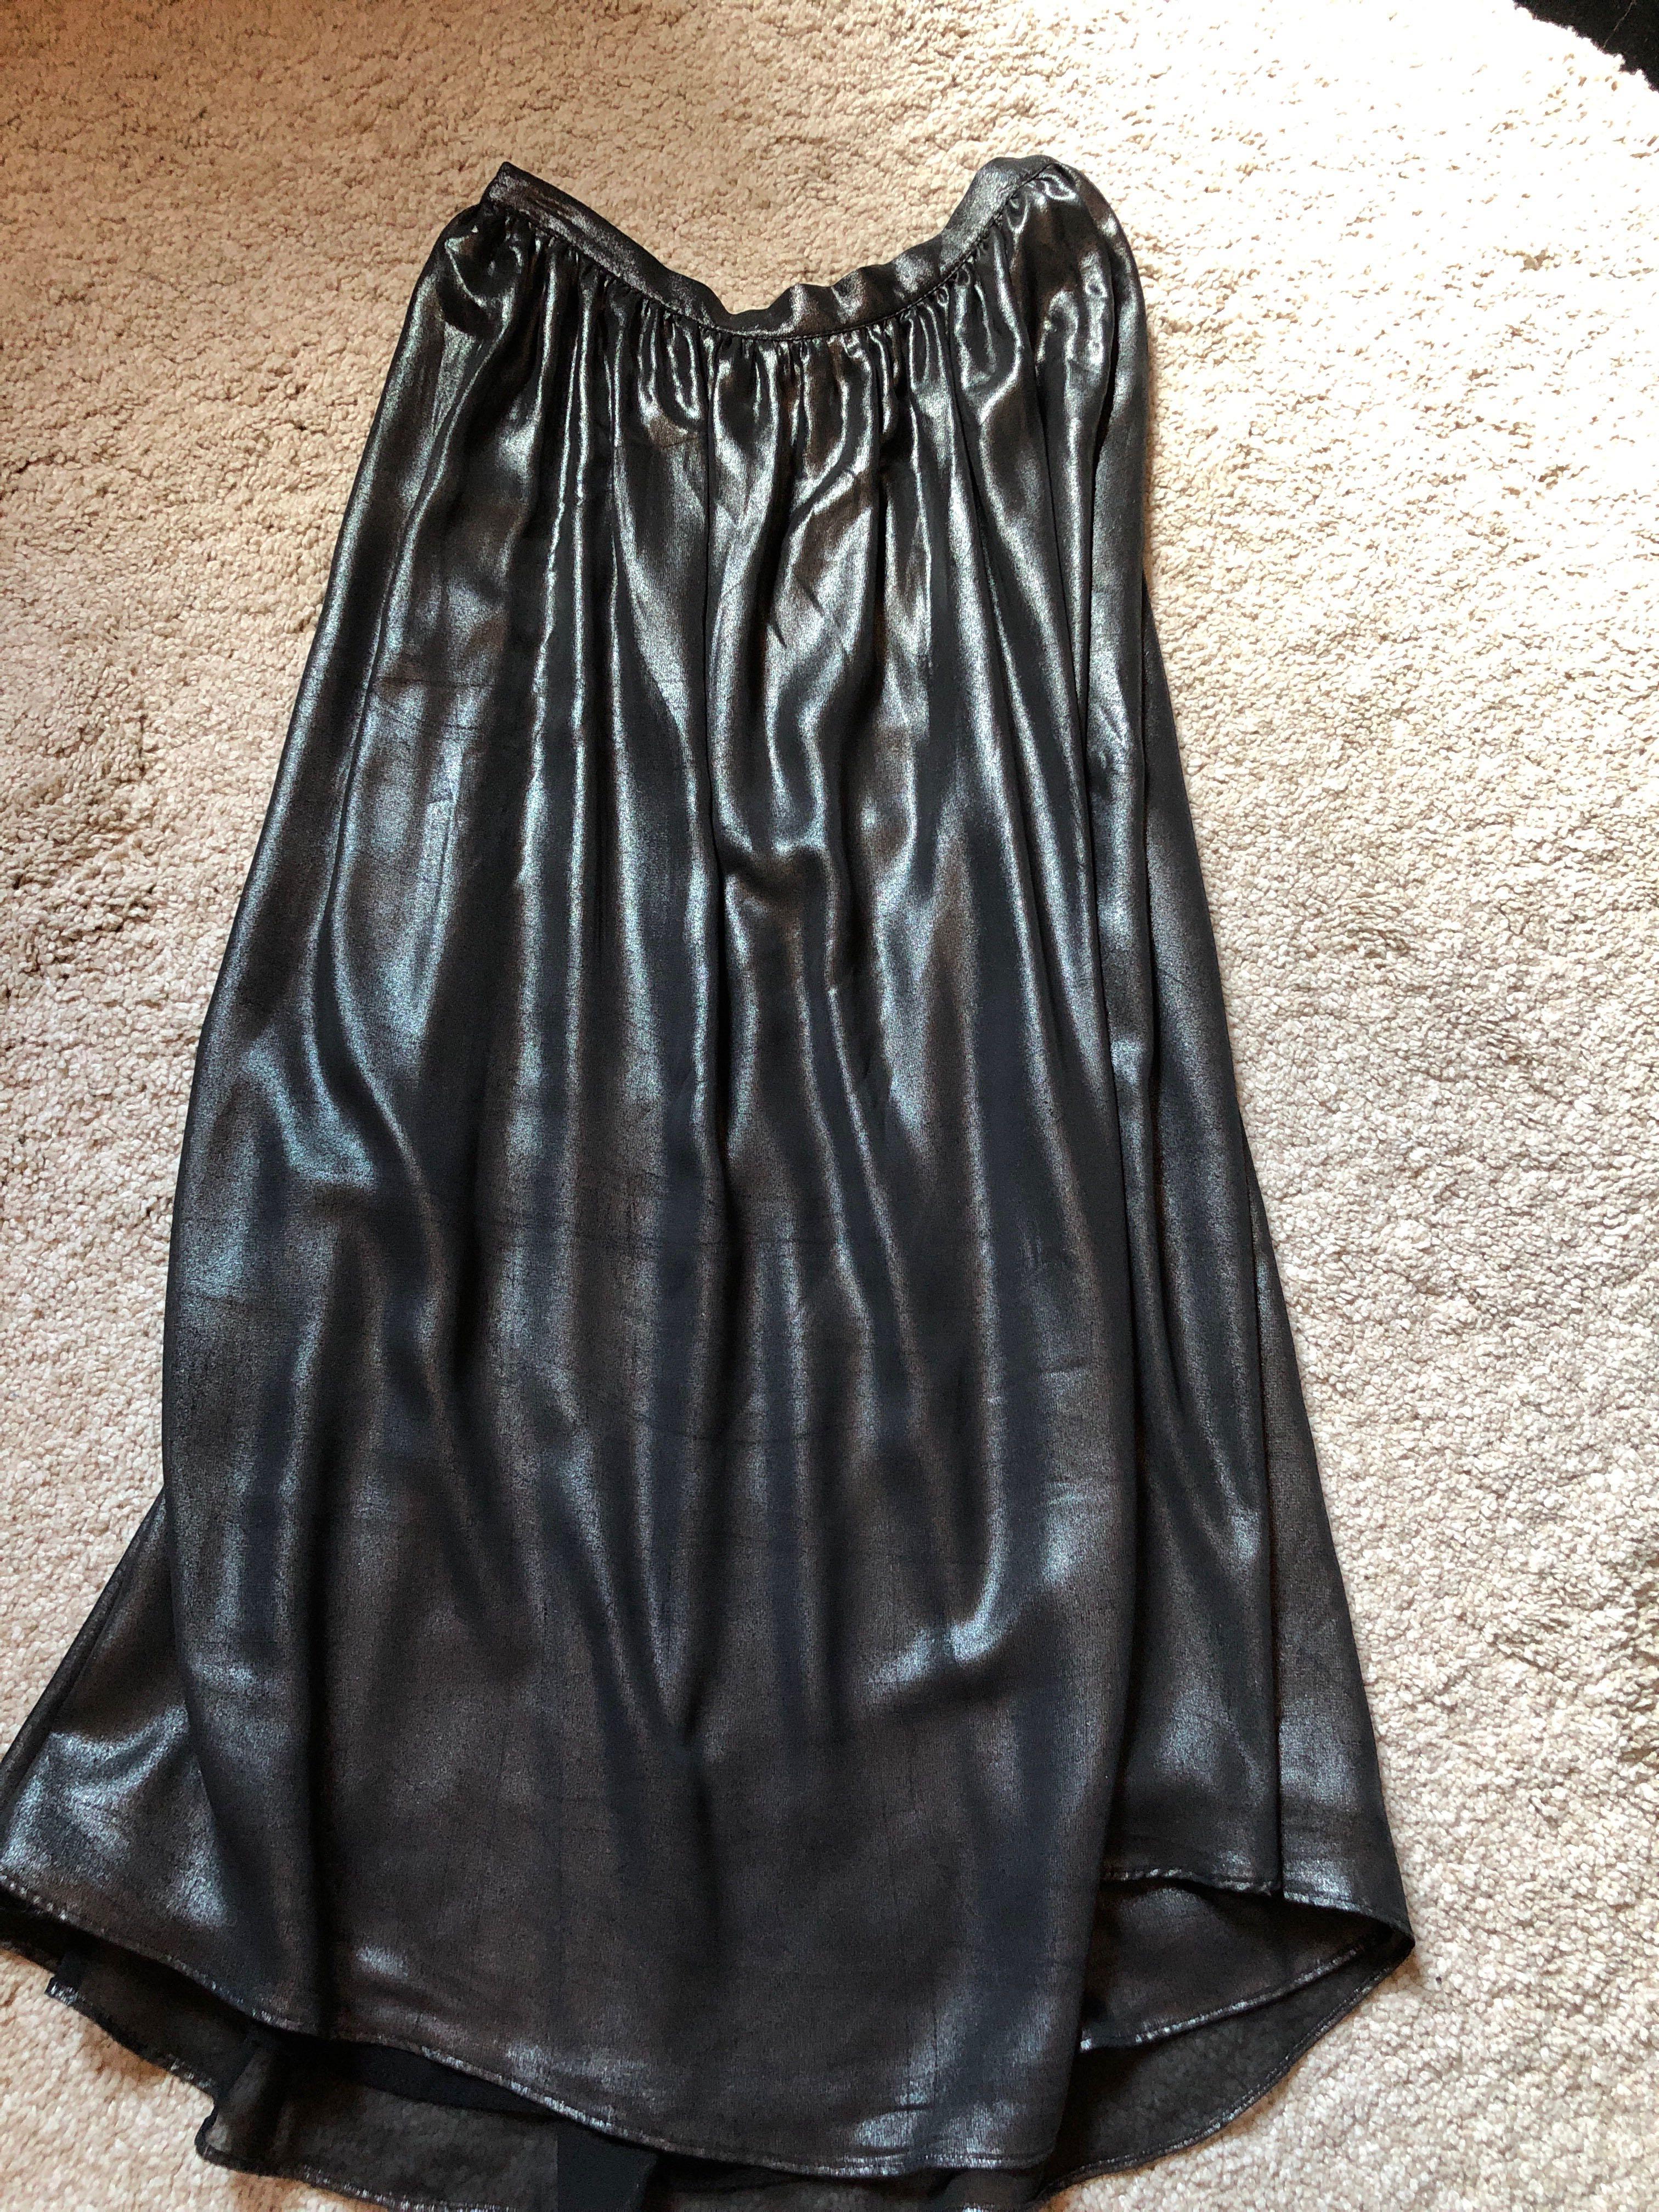 821c174ce5b Zara shimmer skirt, Women's Fashion, Clothes, Dresses & Skirts on Carousell